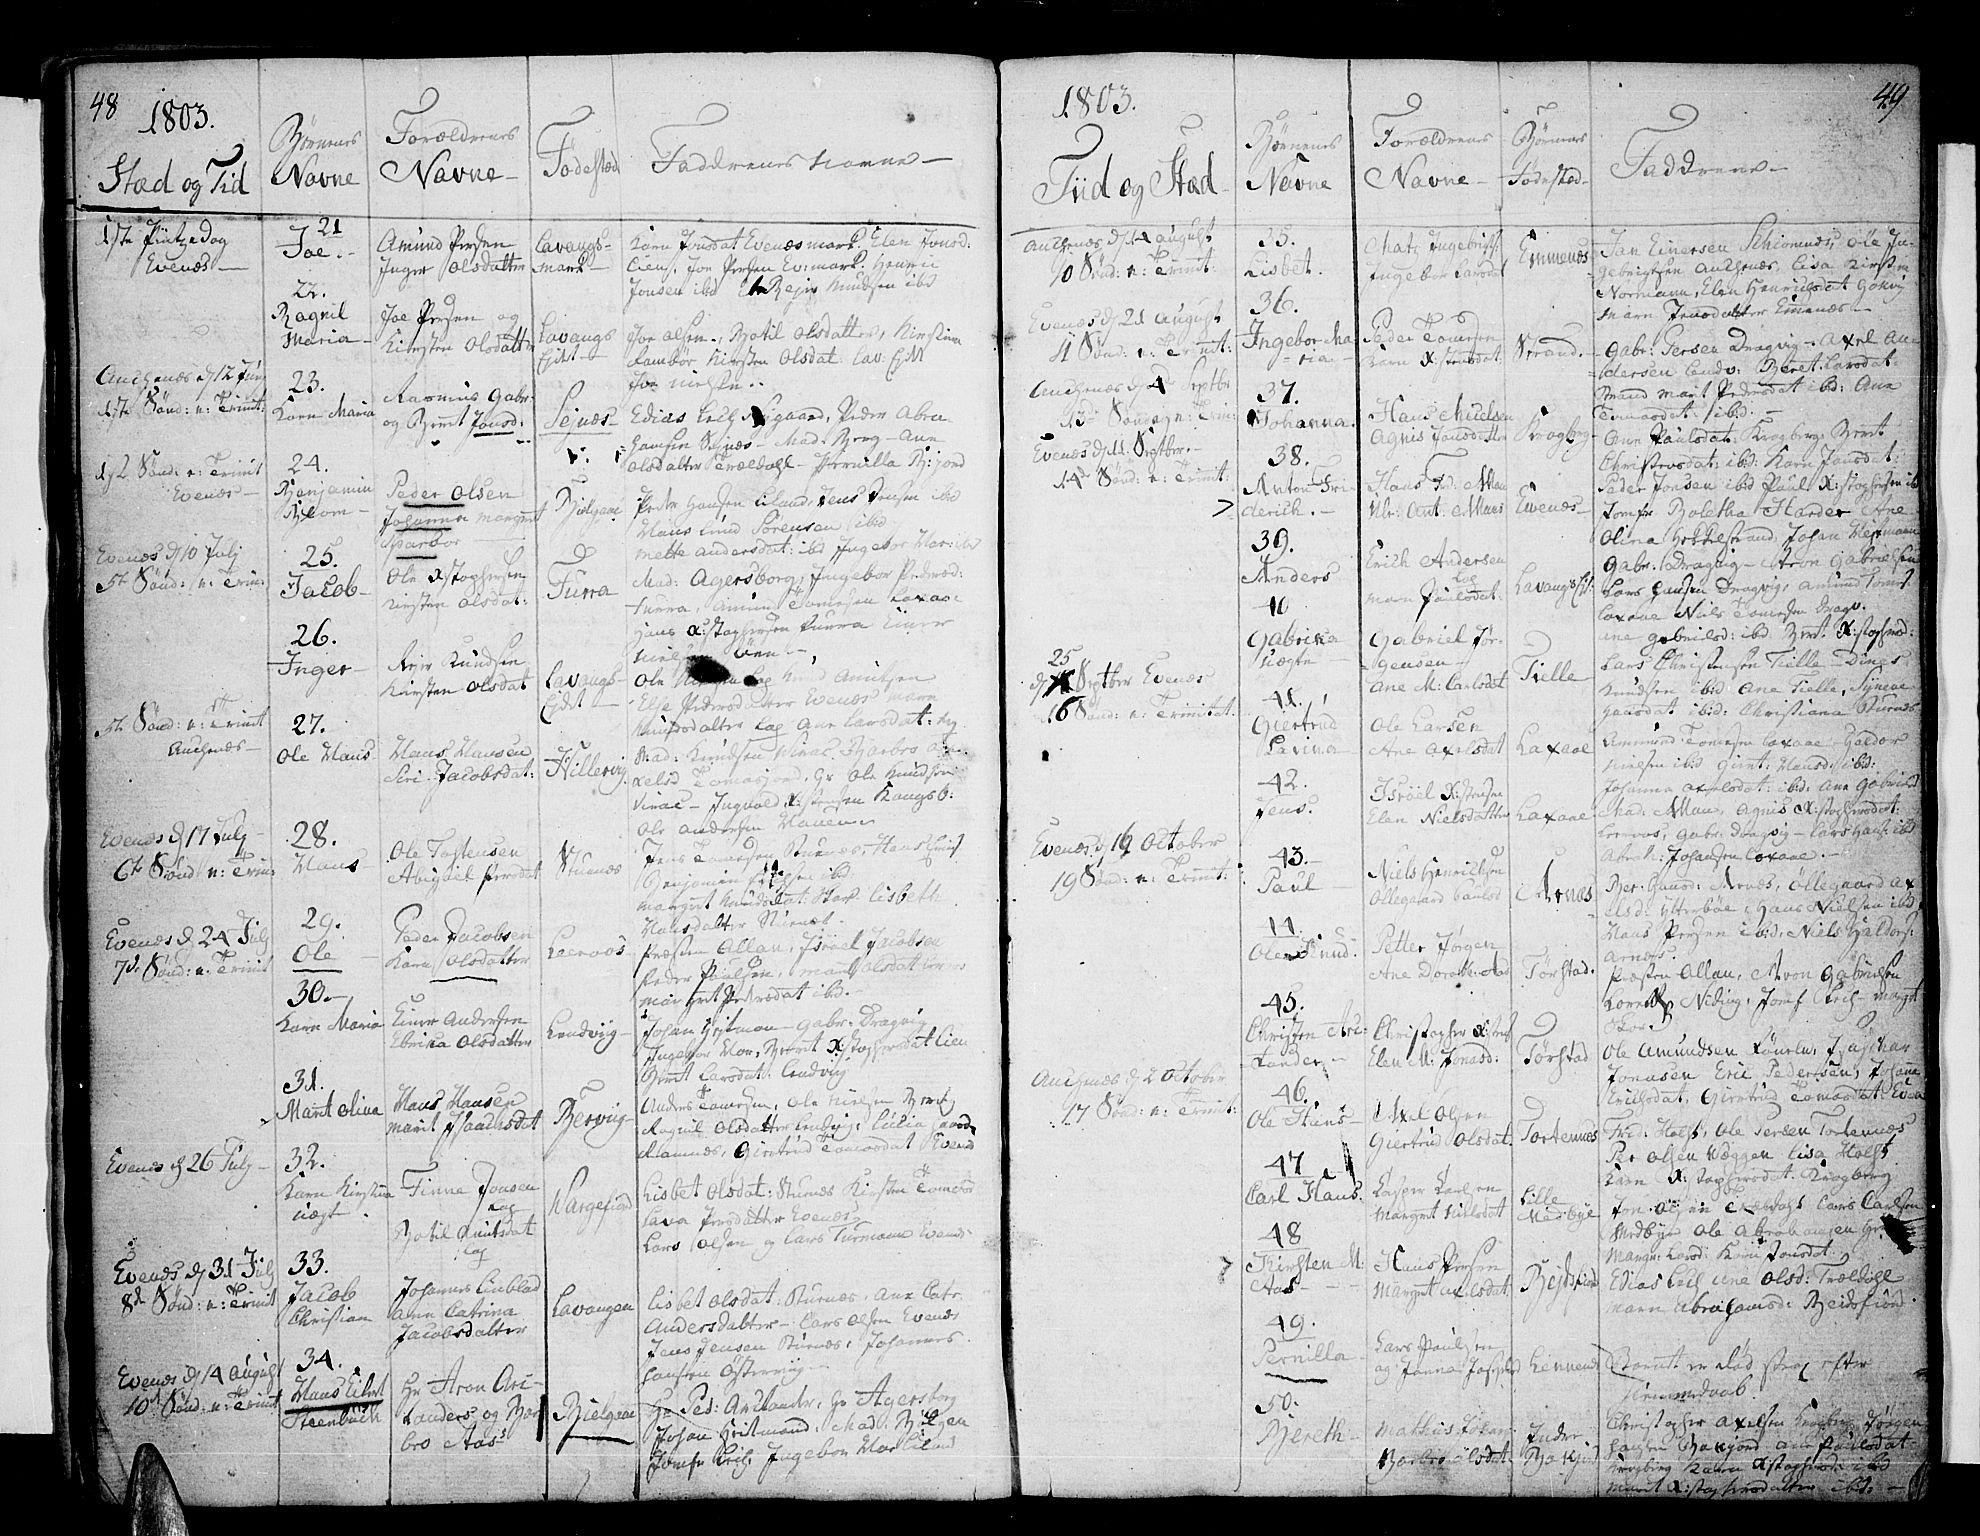 SAT, Ministerialprotokoller, klokkerbøker og fødselsregistre - Nordland, 863/L0893: Ministerialbok nr. 863A05, 1794-1821, s. 48-49